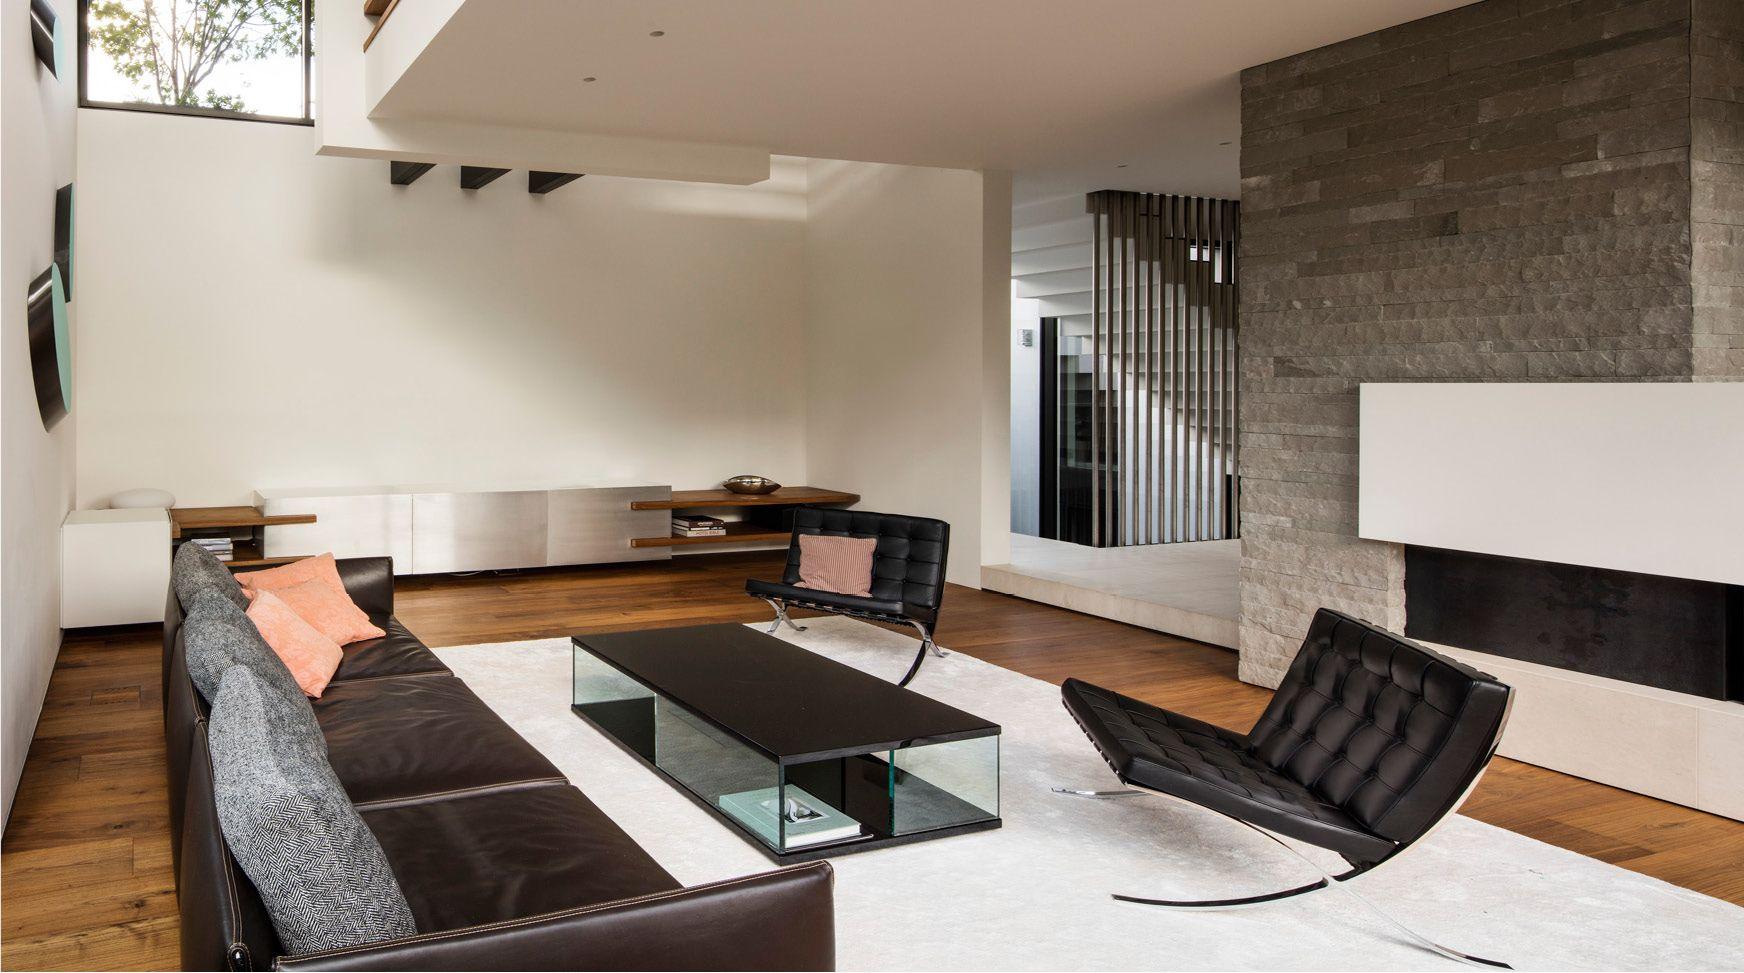 Projekt   Haus TI Frankfurt | Architekten Bda: Fuchs, Wacker.